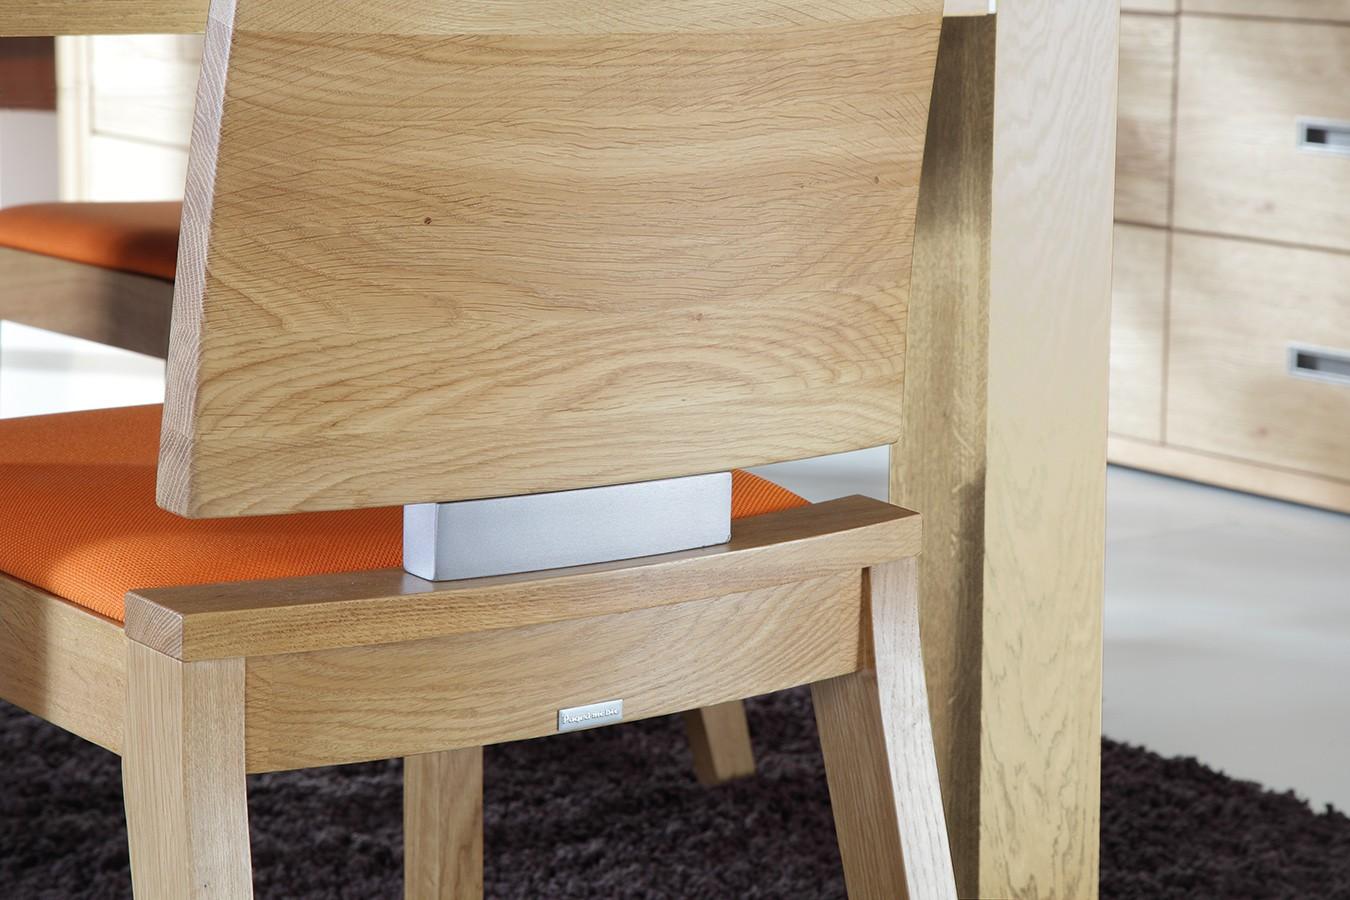 test1 Стул деревянный Natur (Paged, Польша)